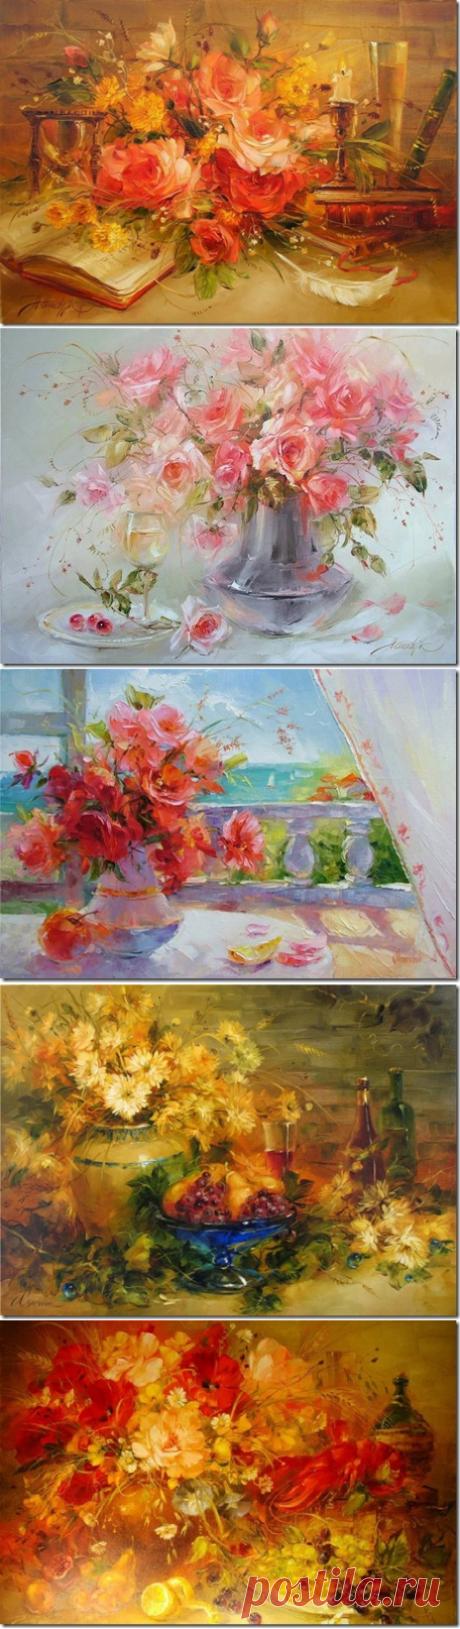 Waltz of the Flowers. Anna Homchik